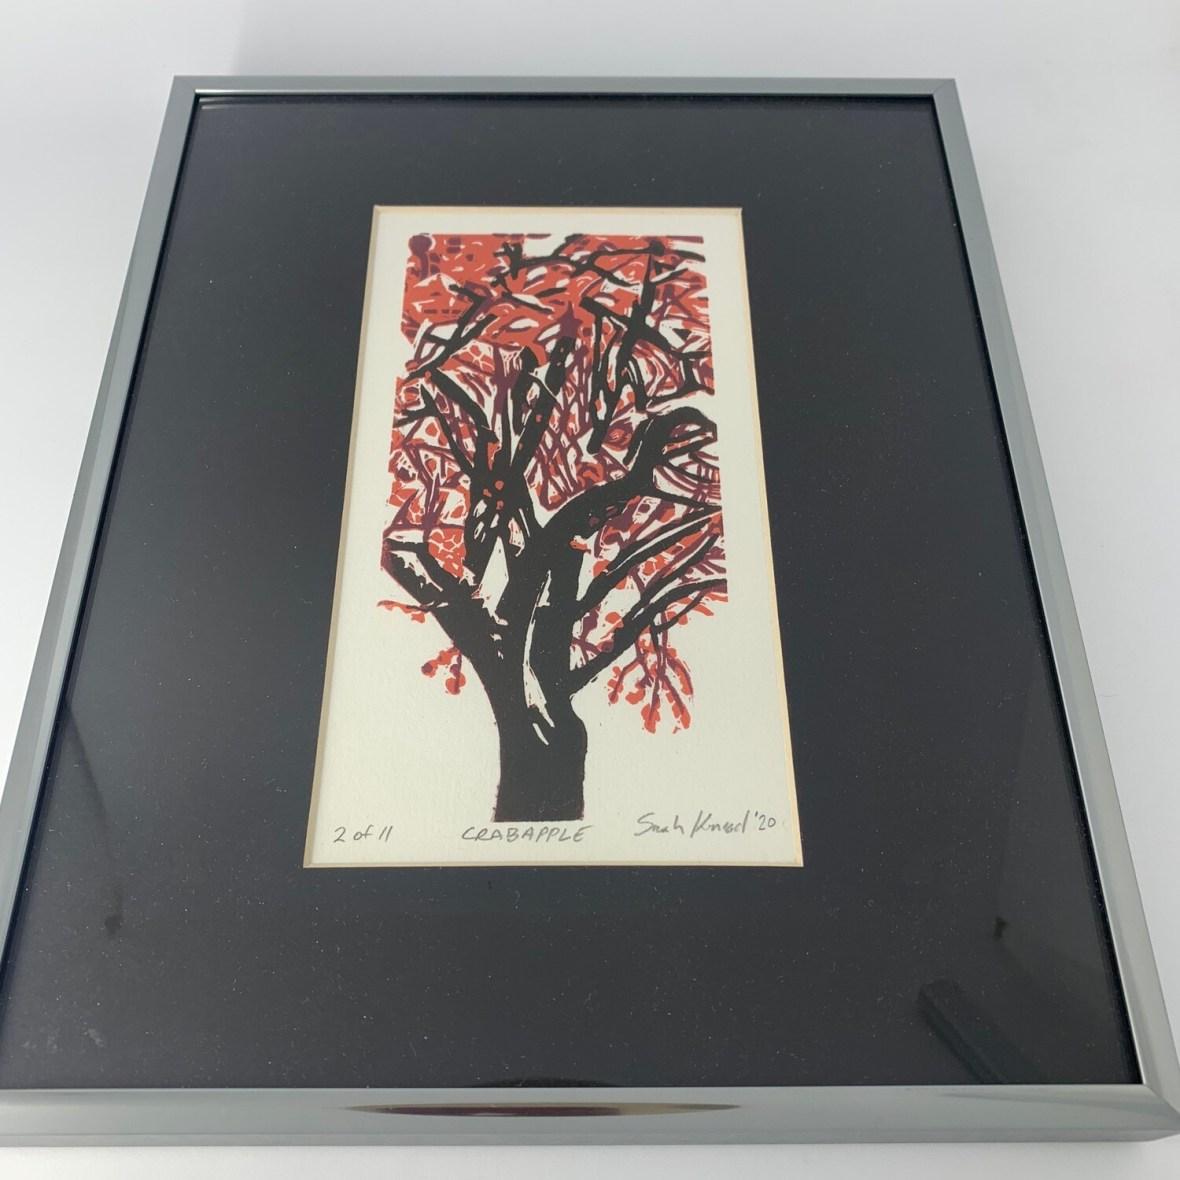 Crabapple by Sarah Konrad (linoleum cut print)